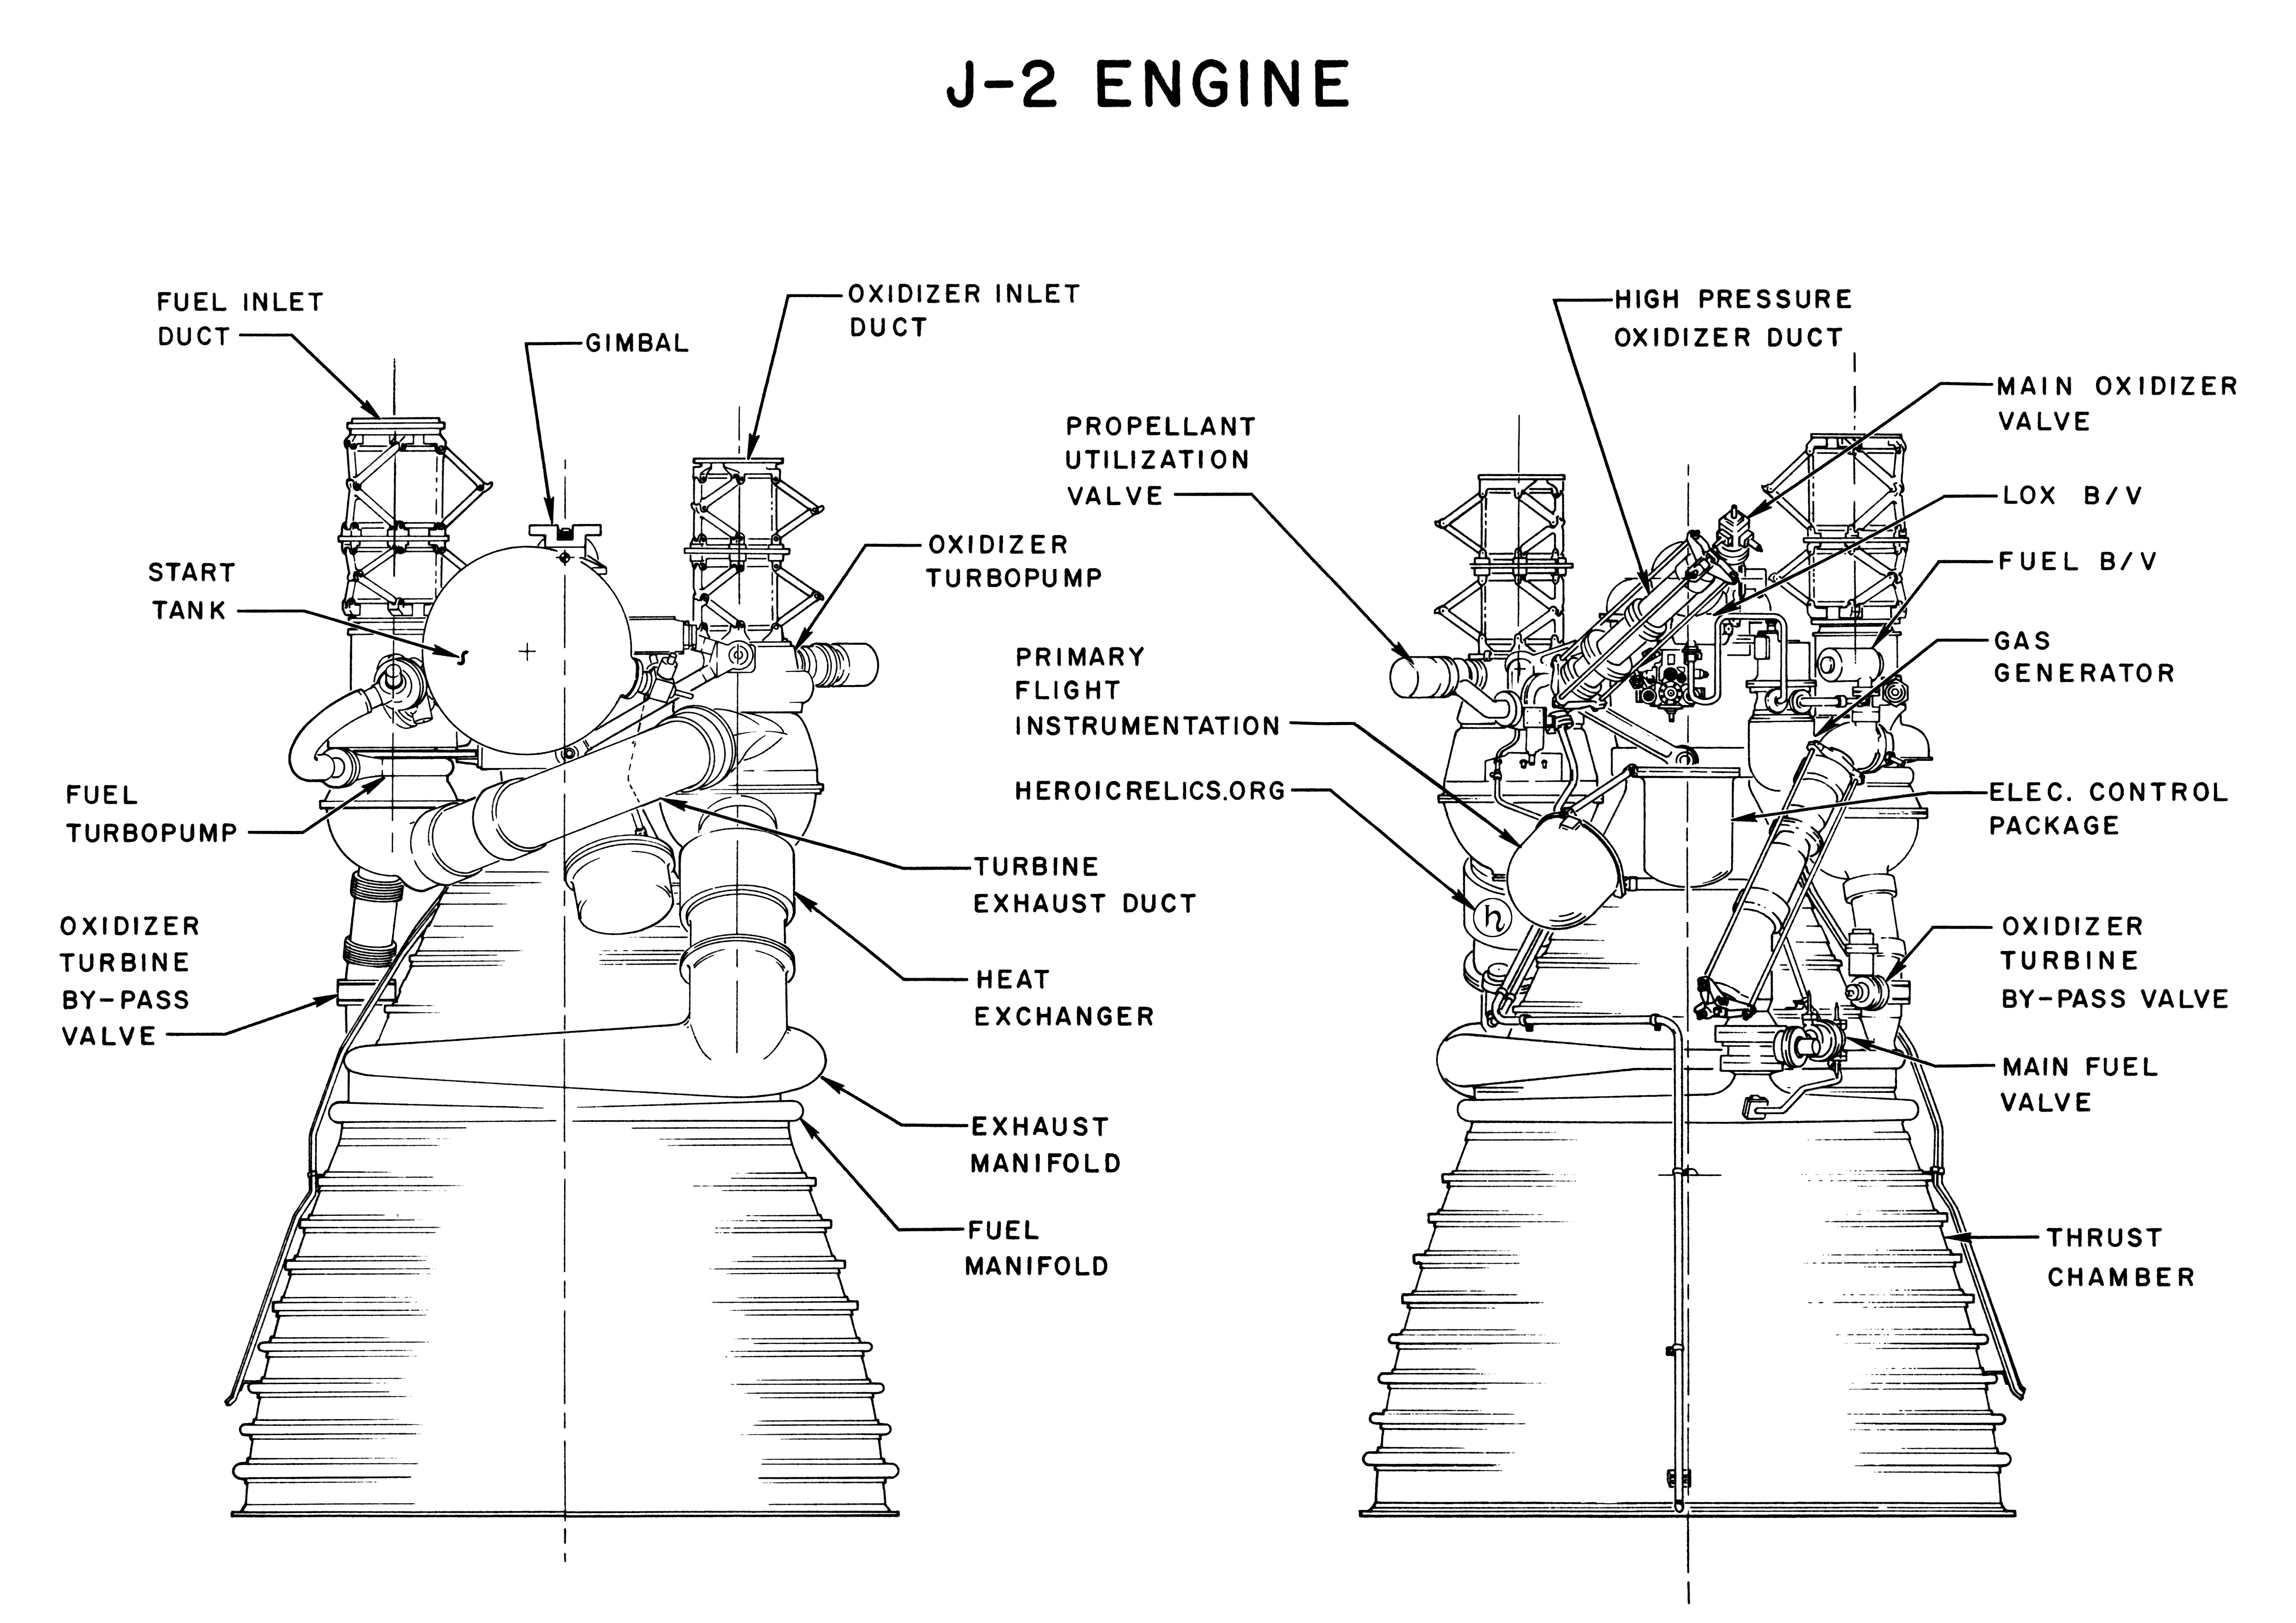 [DIAGRAM_38IU]  J-2 With Callouts | 2 Engine Diagram |  | Heroic Relics